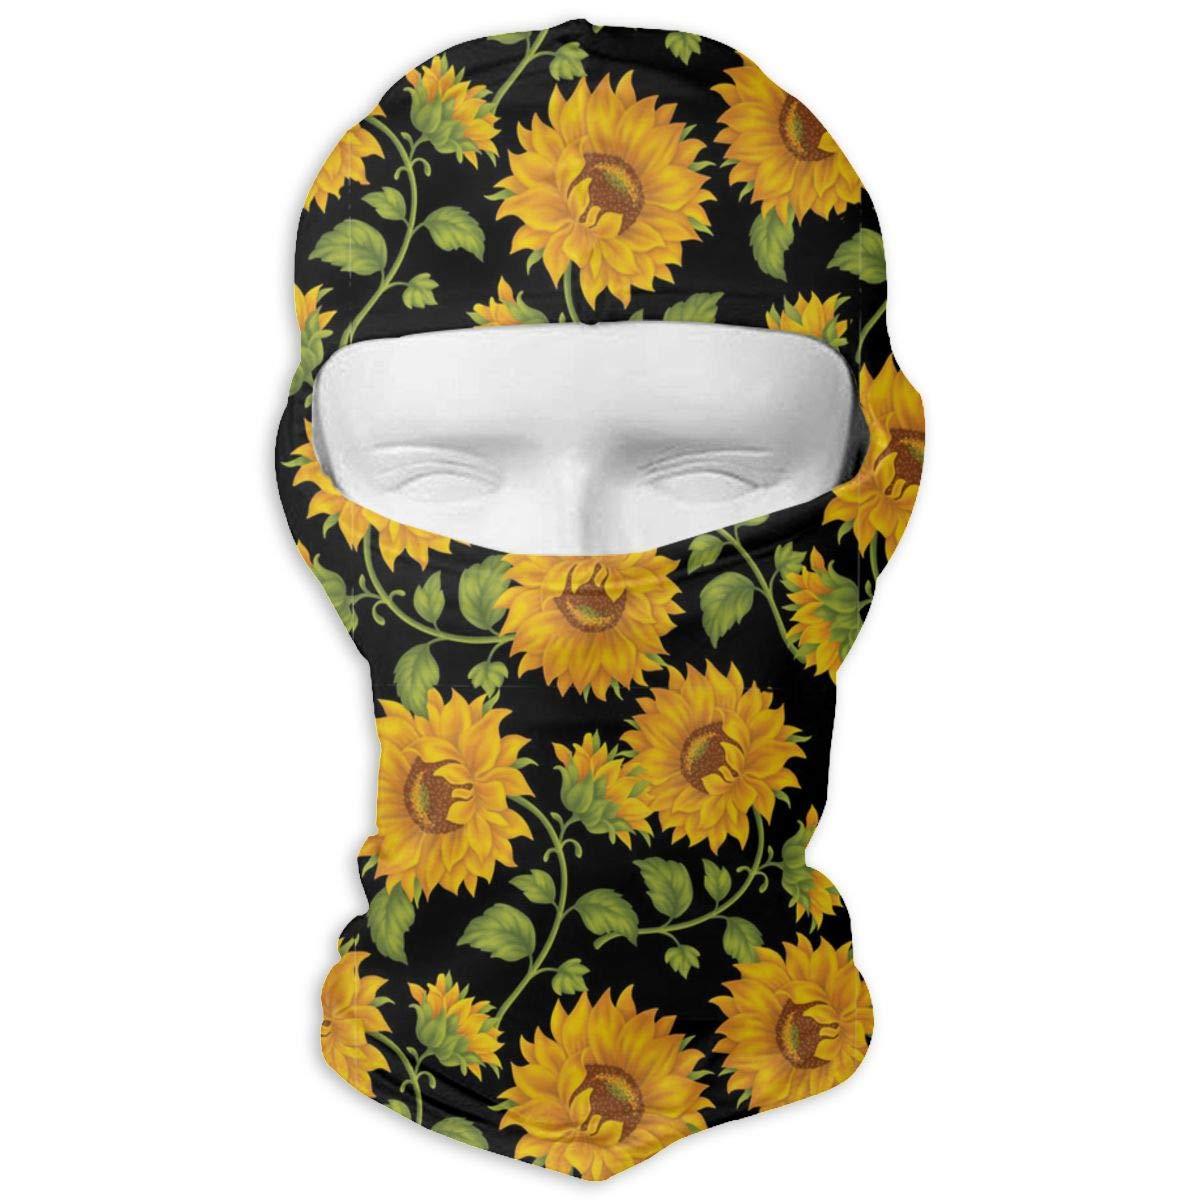 Wind-Resistant Face Mask LaoJi Romantic Sunflowers Winter Ski Mask Balaclava Hood